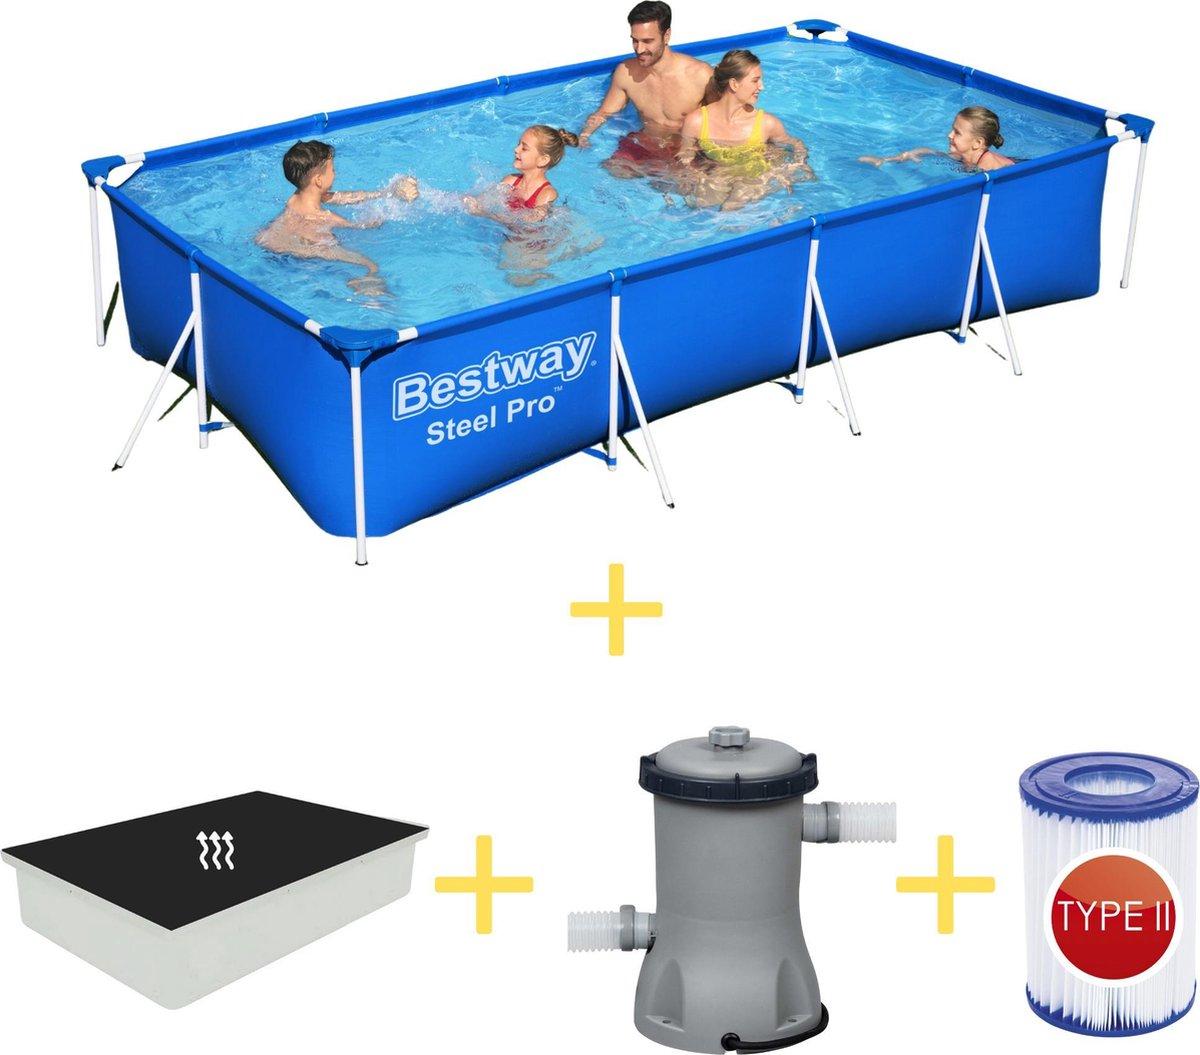 Bestway Zwembad - Steel Pro - 400 x 211 x 81 - Inclusief Solarzeil, Filterpomp & Filter